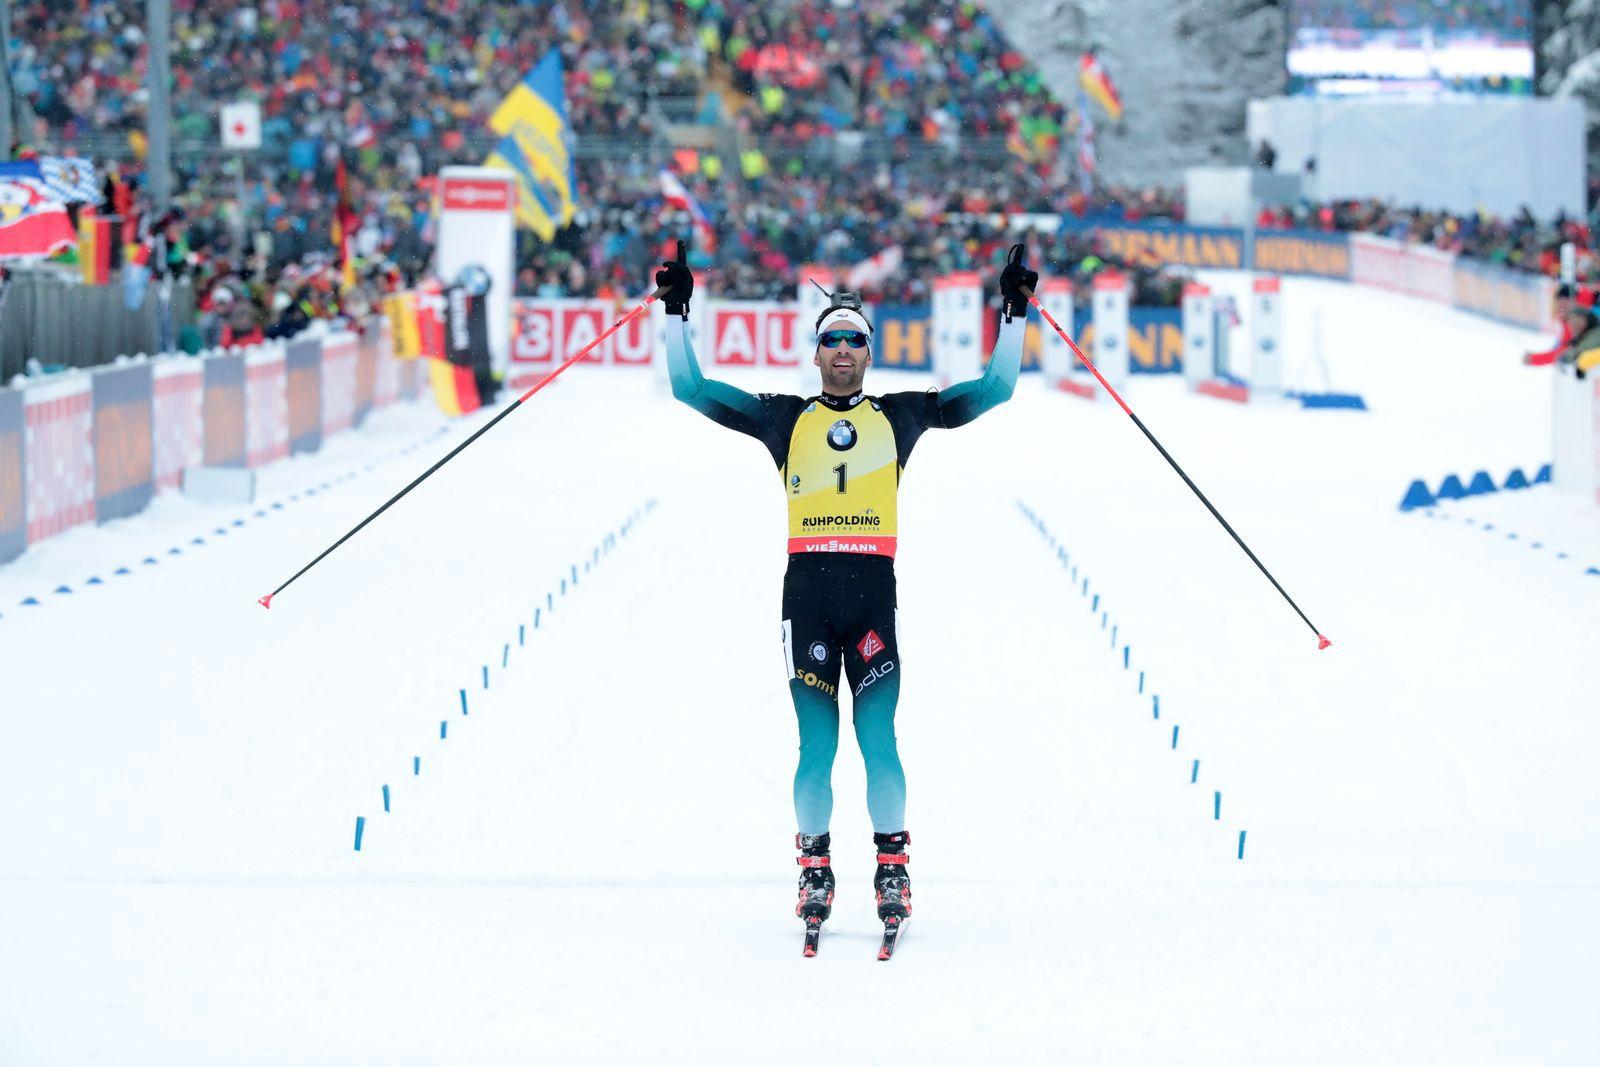 calendrier biathlon antholz 2020